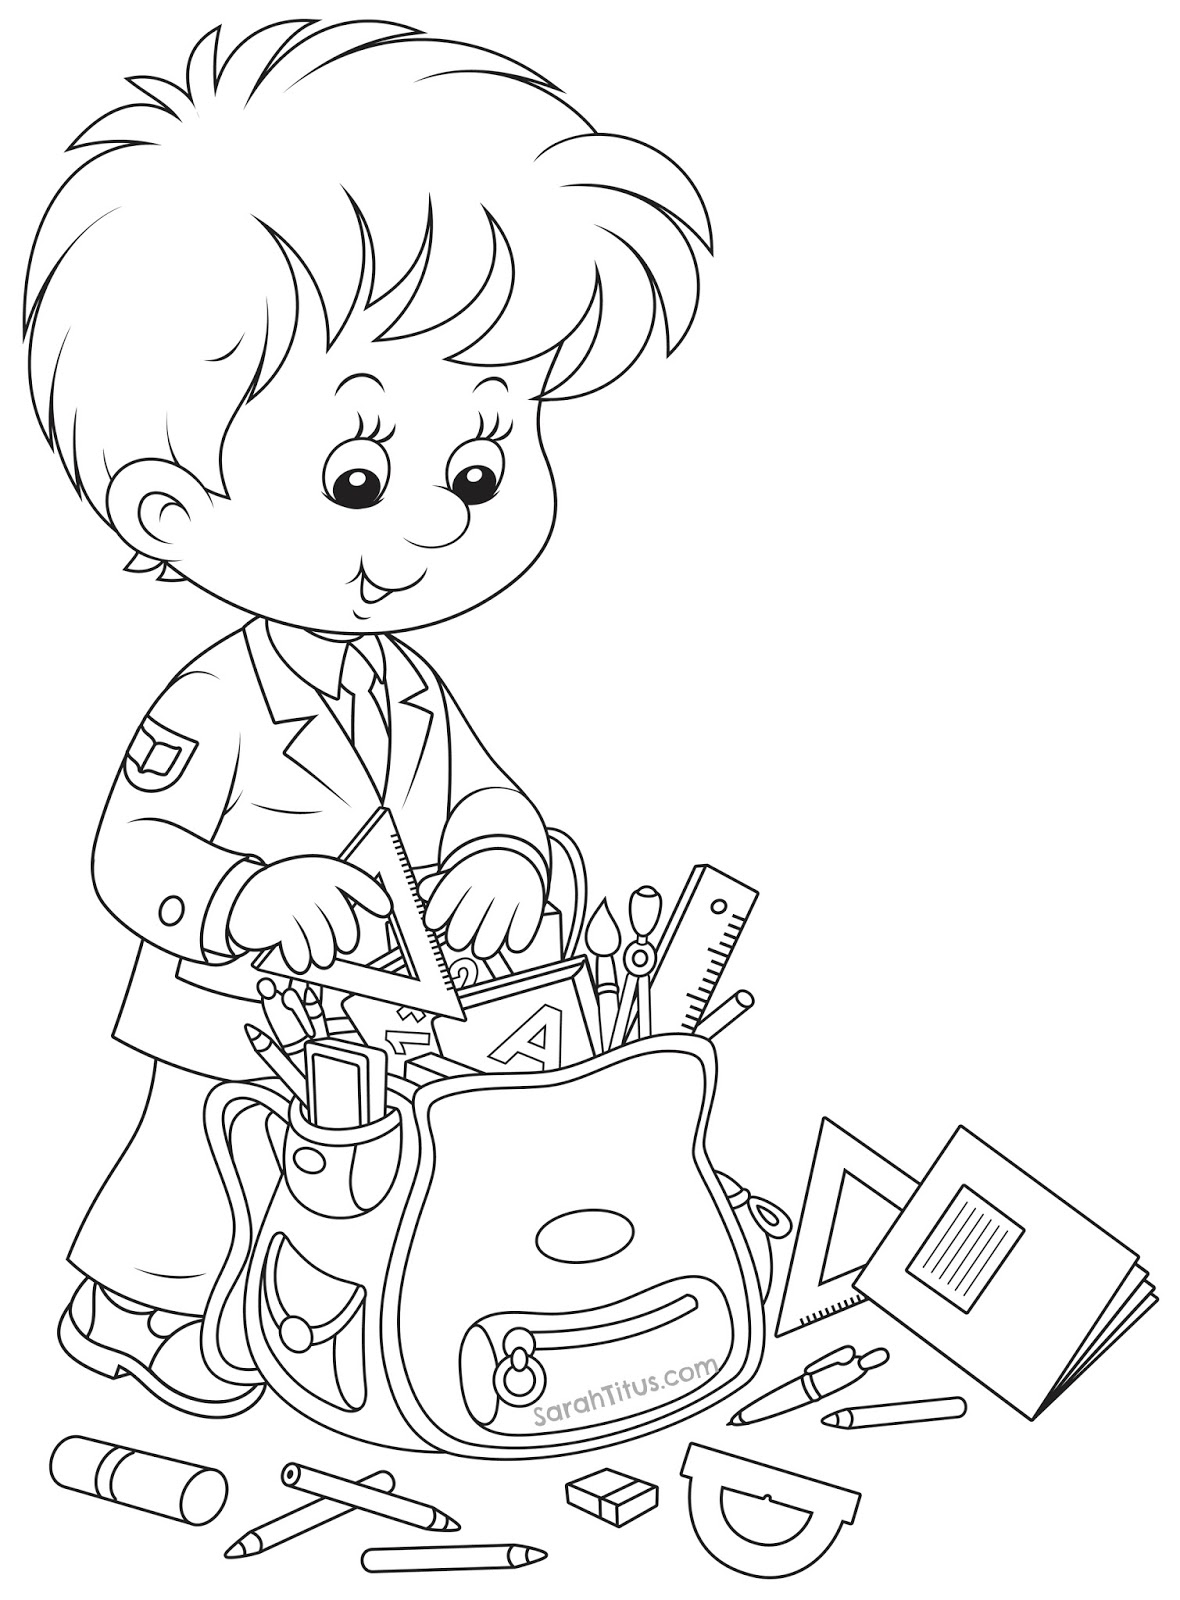 school kids coloring pages | Coisas que gosto de partilhar: Expressão Plástica - início ...